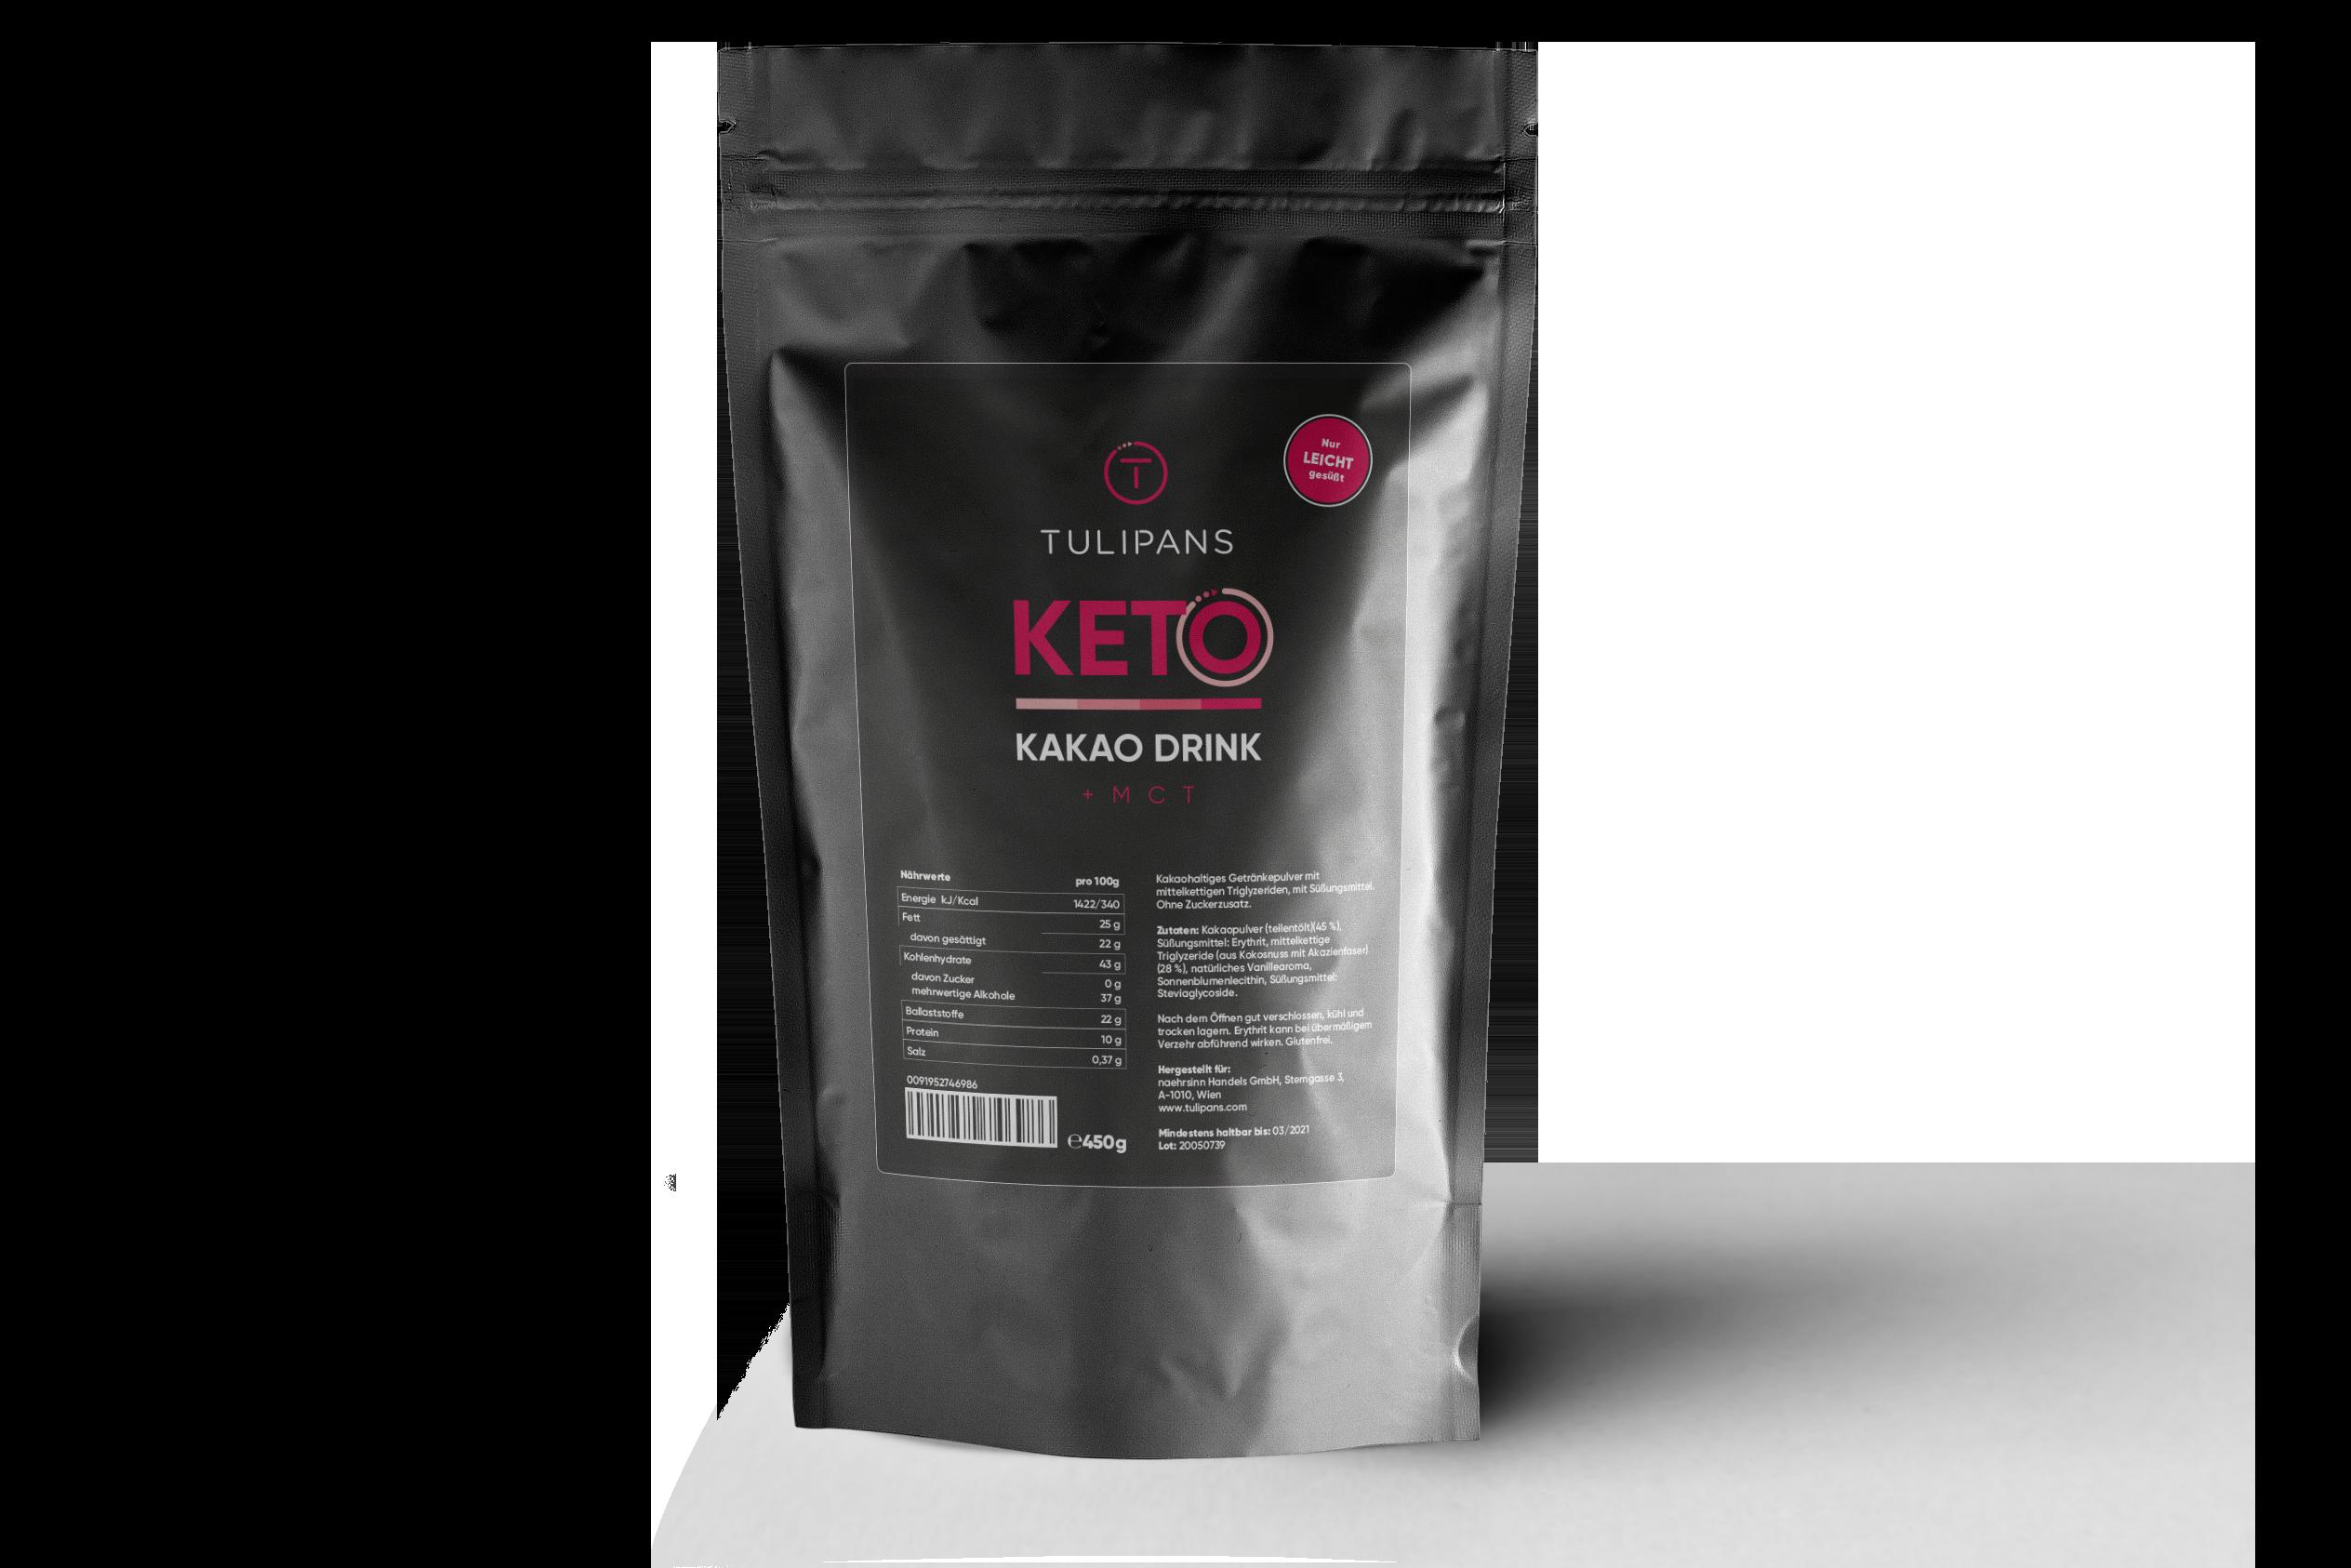 KETO KAKAO DRINK + MCT (Vegan) 450g Beutel